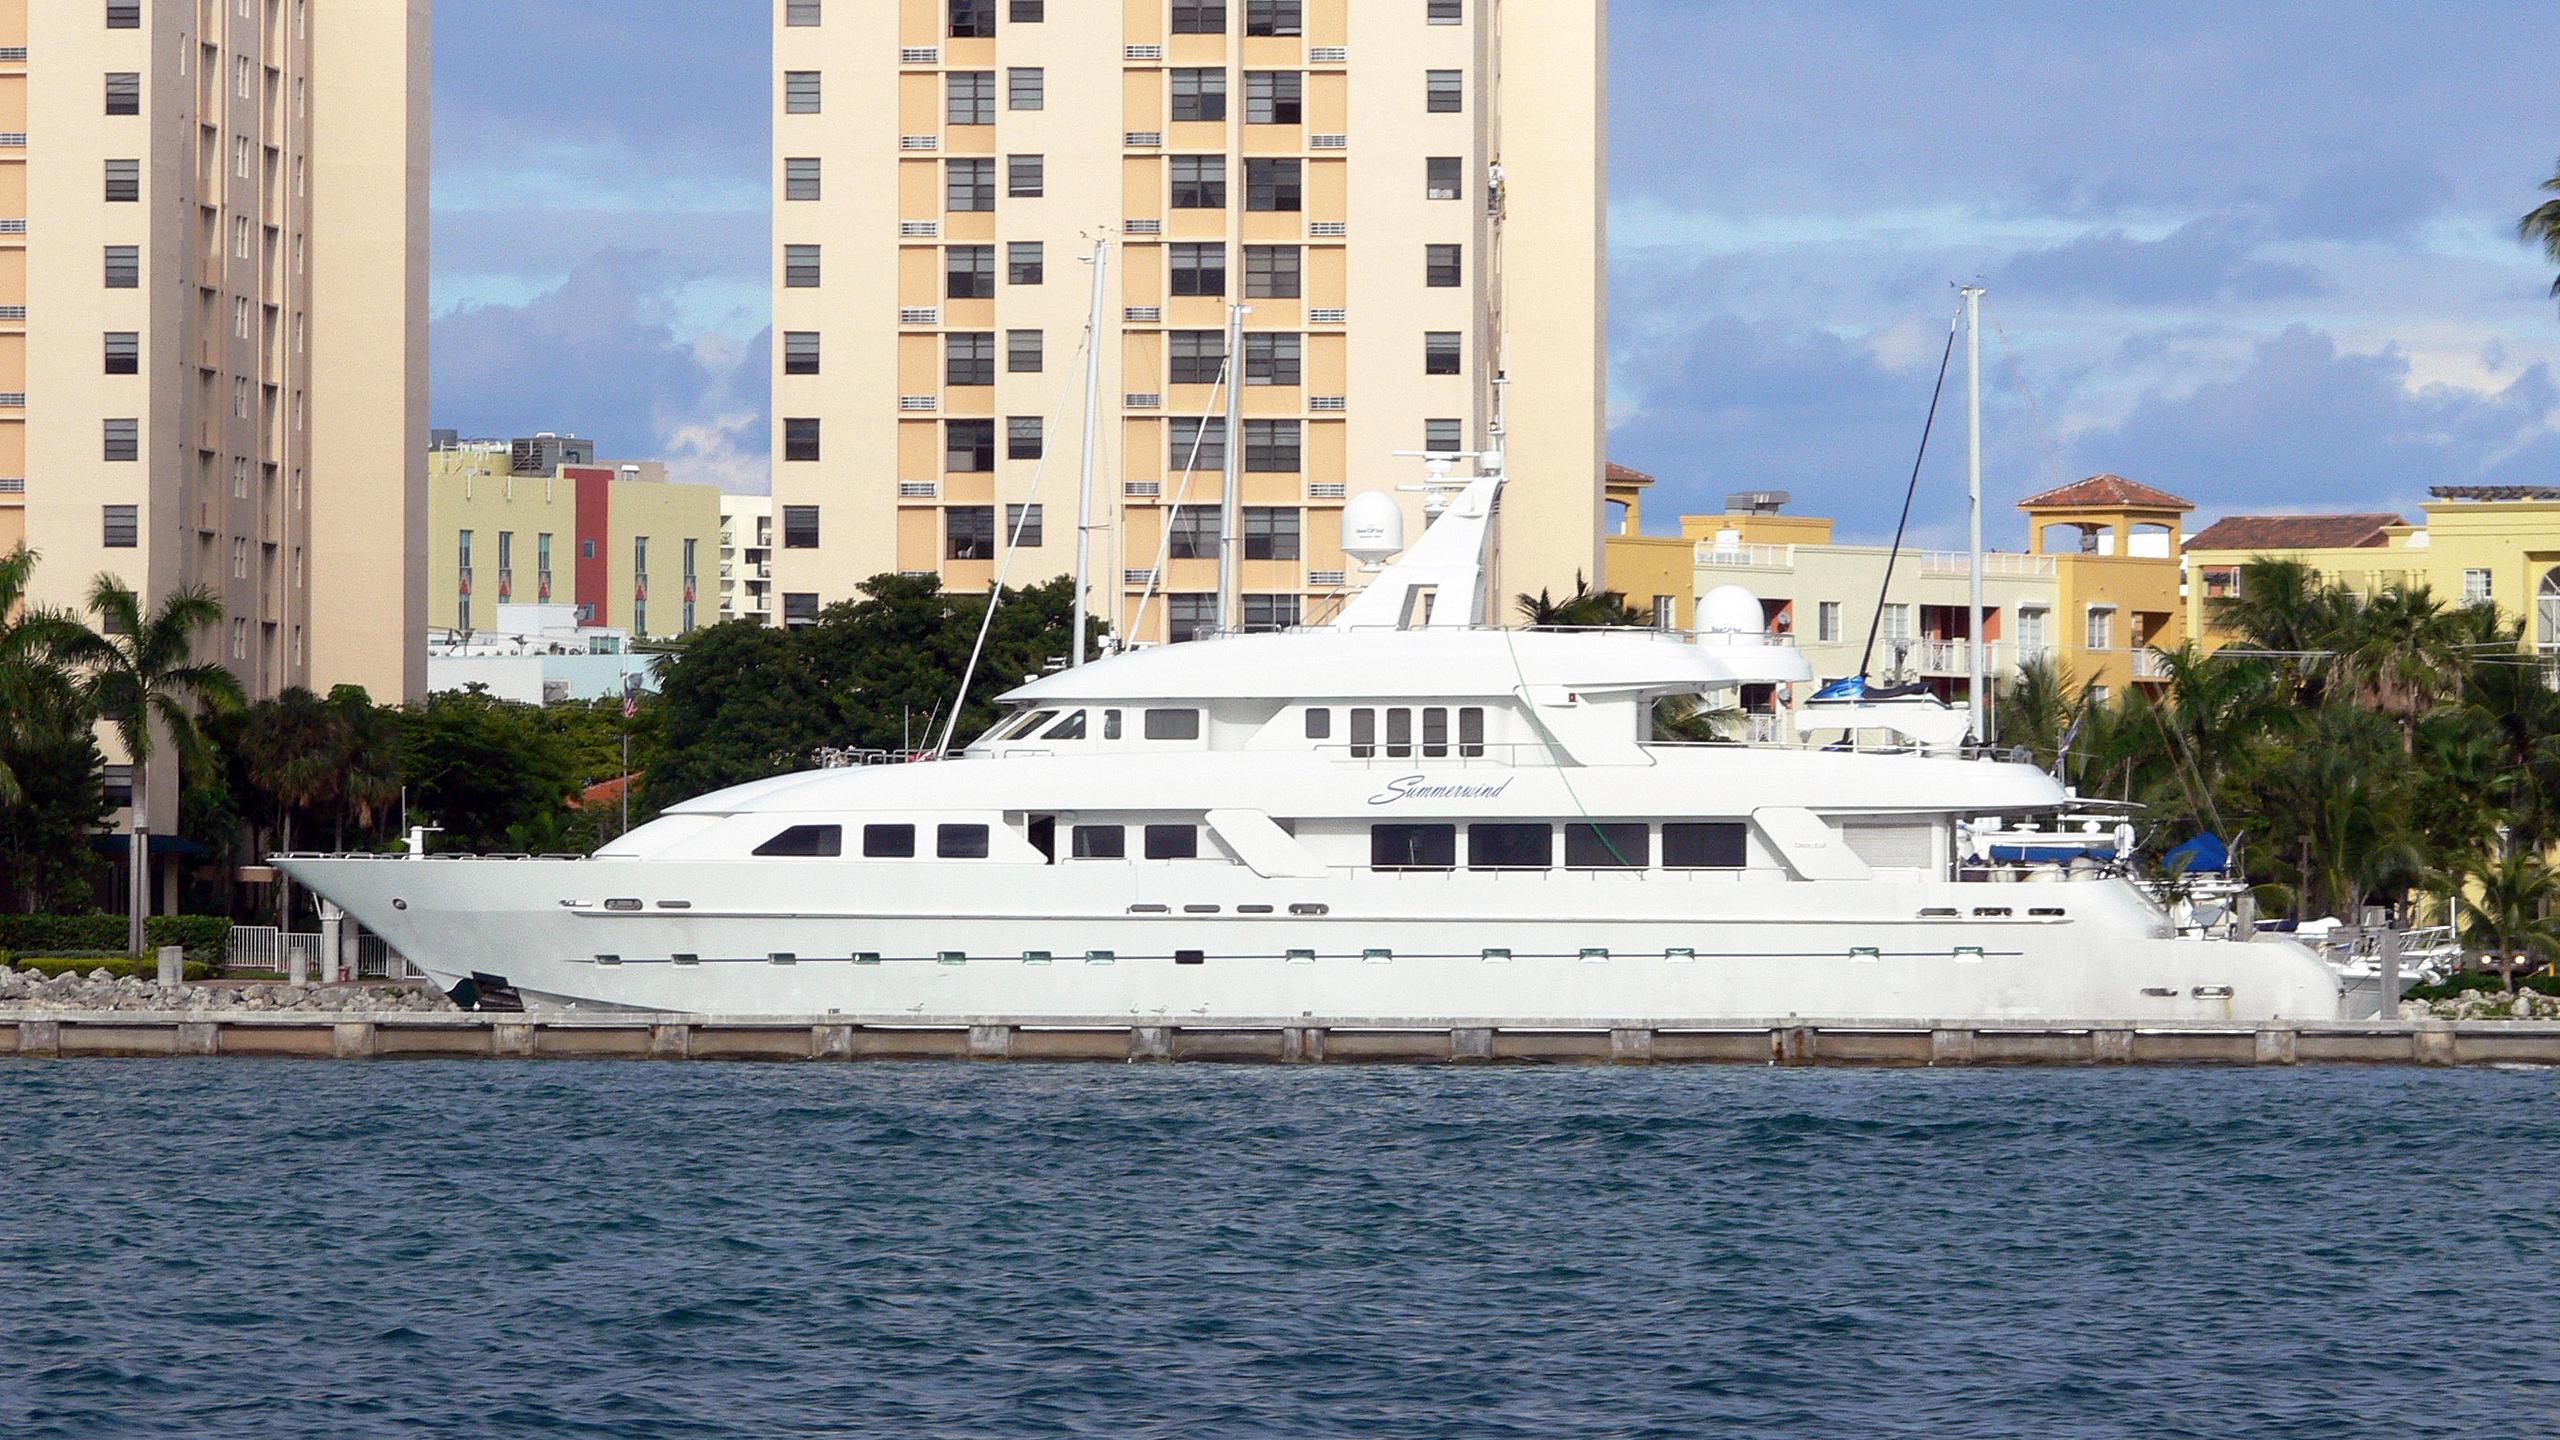 island-heiress-motor-yacht-cheoy-lee-global-145-1996-44m-profile